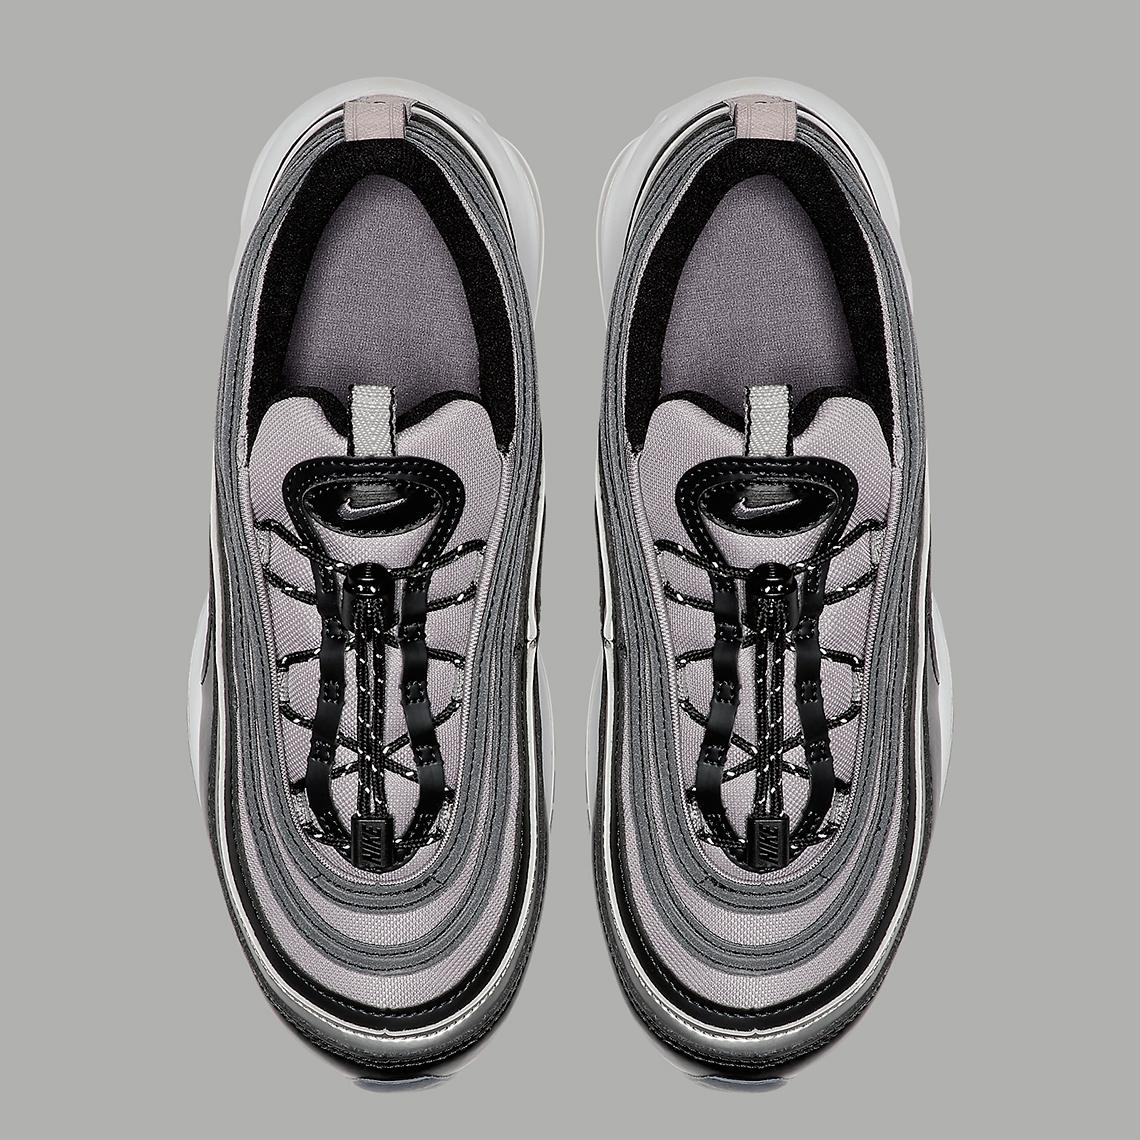 Nike Air Max 97 Grey Black BQ8437 001 Release Info